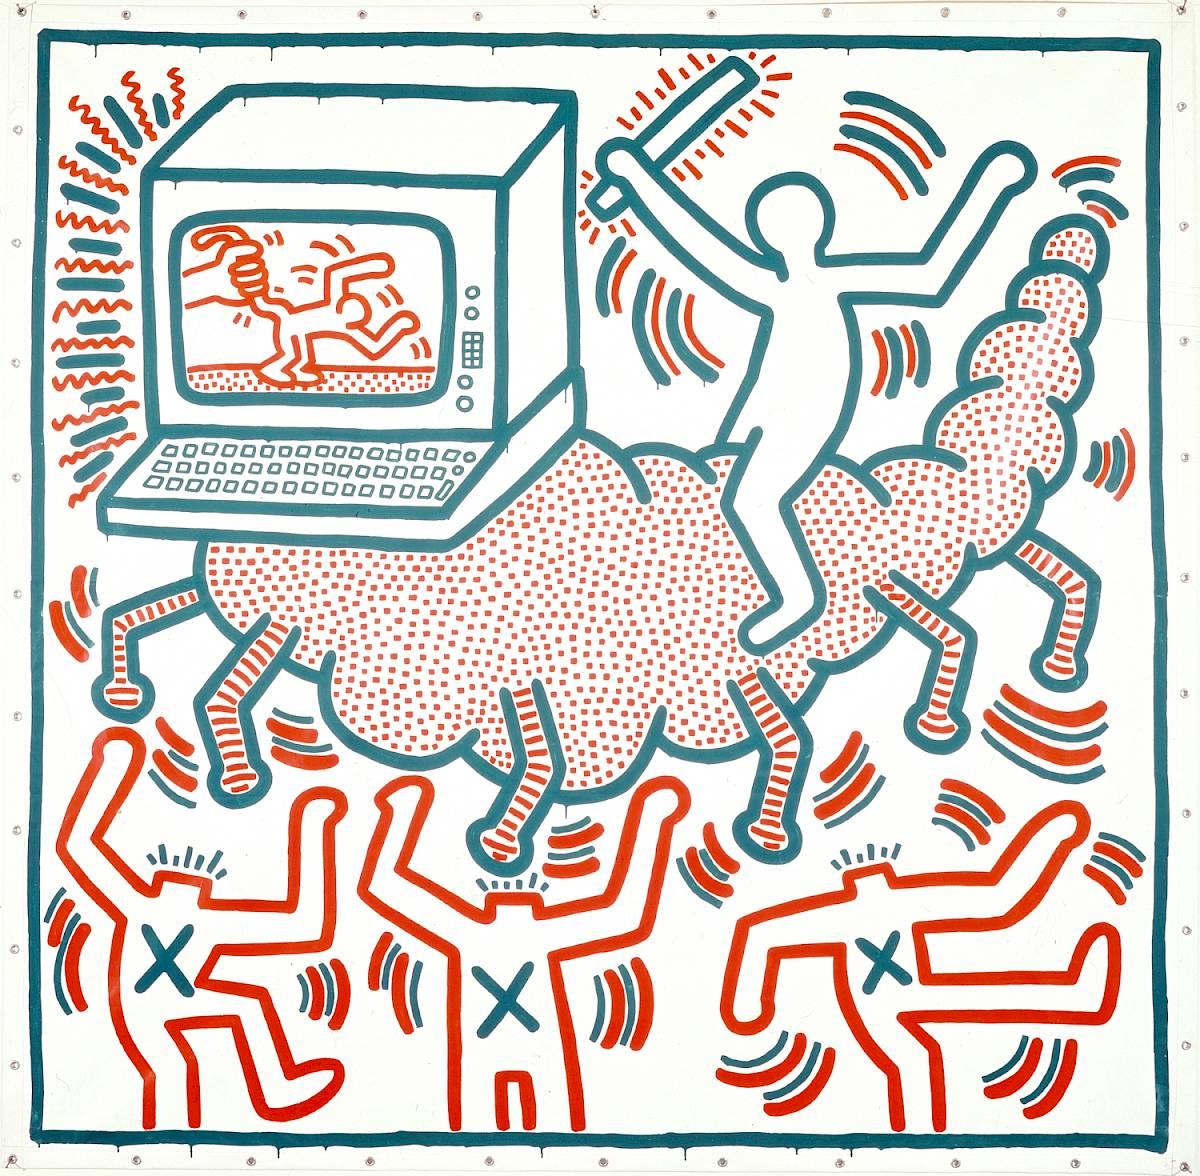 Keith Haring, sans titre, 1983 ©Keith Haring Foundation